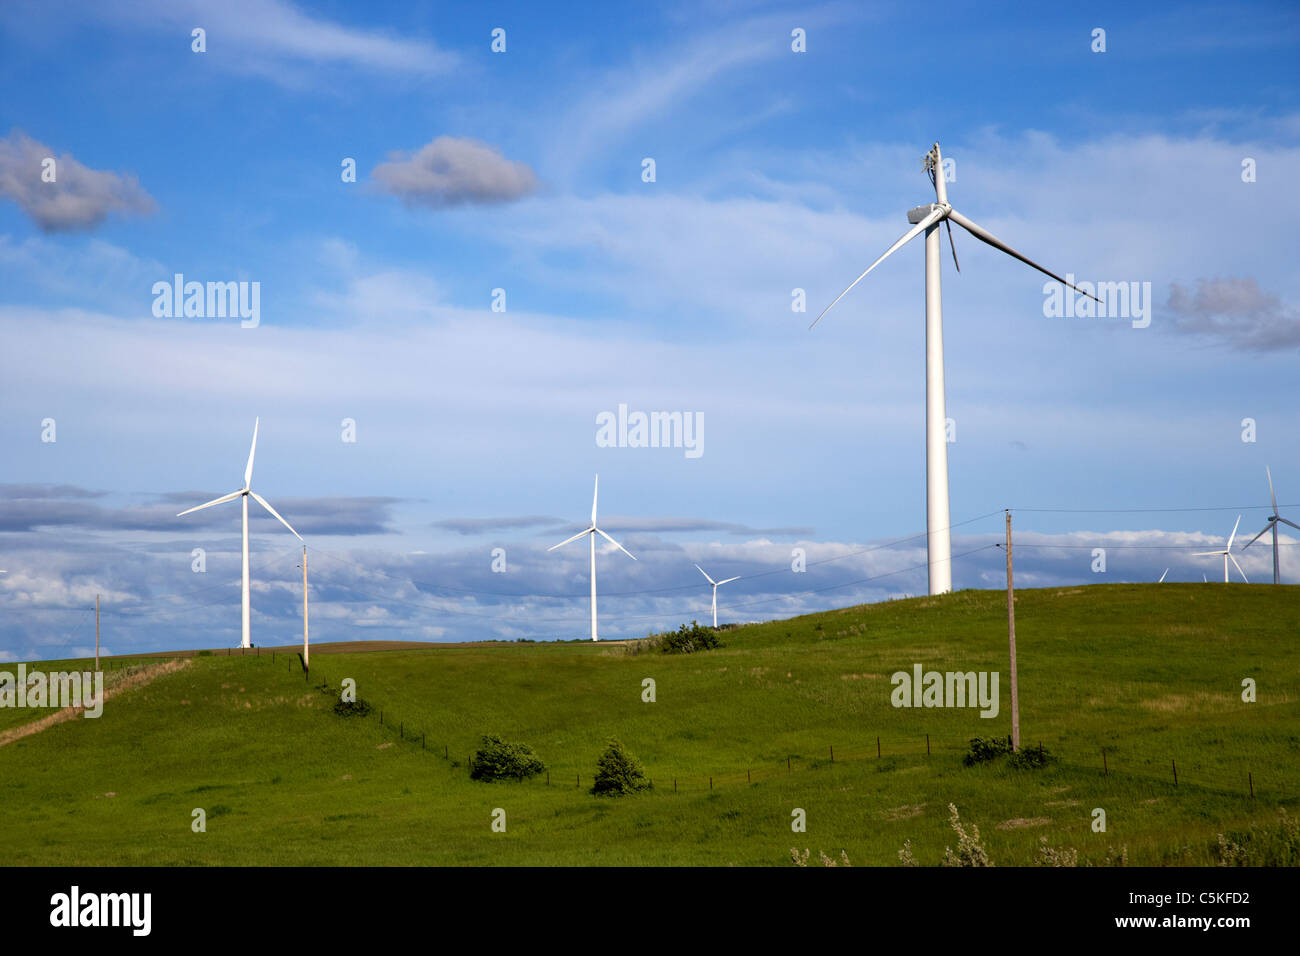 broken wind turbine blade on windmill wind farm near minot north dakota USA - Stock Image